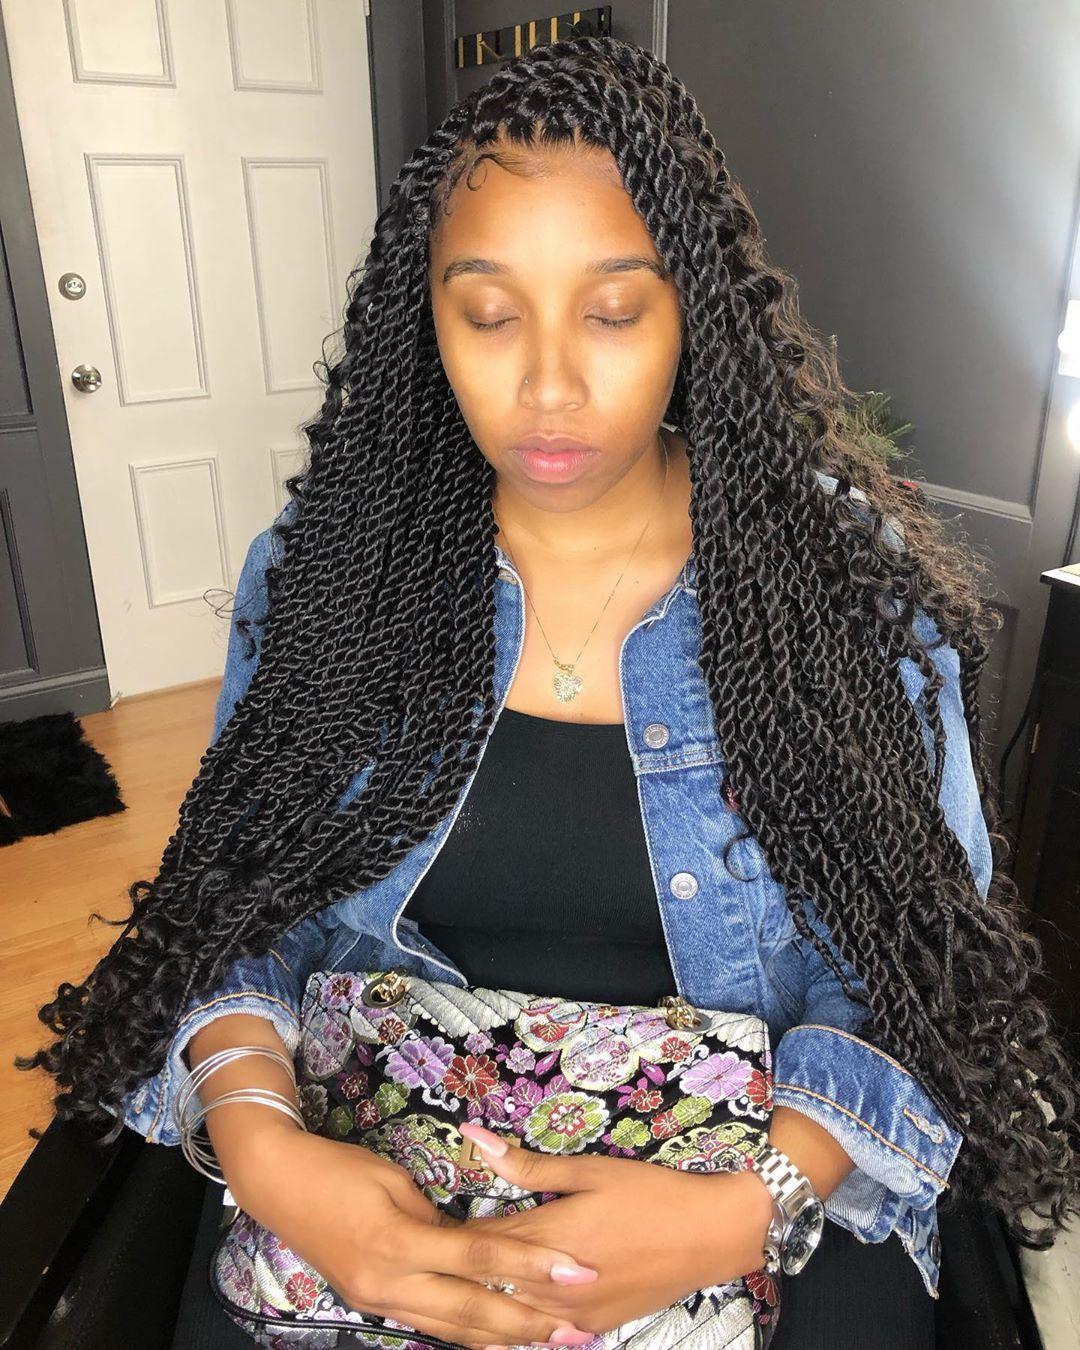 Pin By Jermeria Jackson On Hair Styles In 2020 Havana Twist Braided Hairstyles For Wedding Goddess Twist